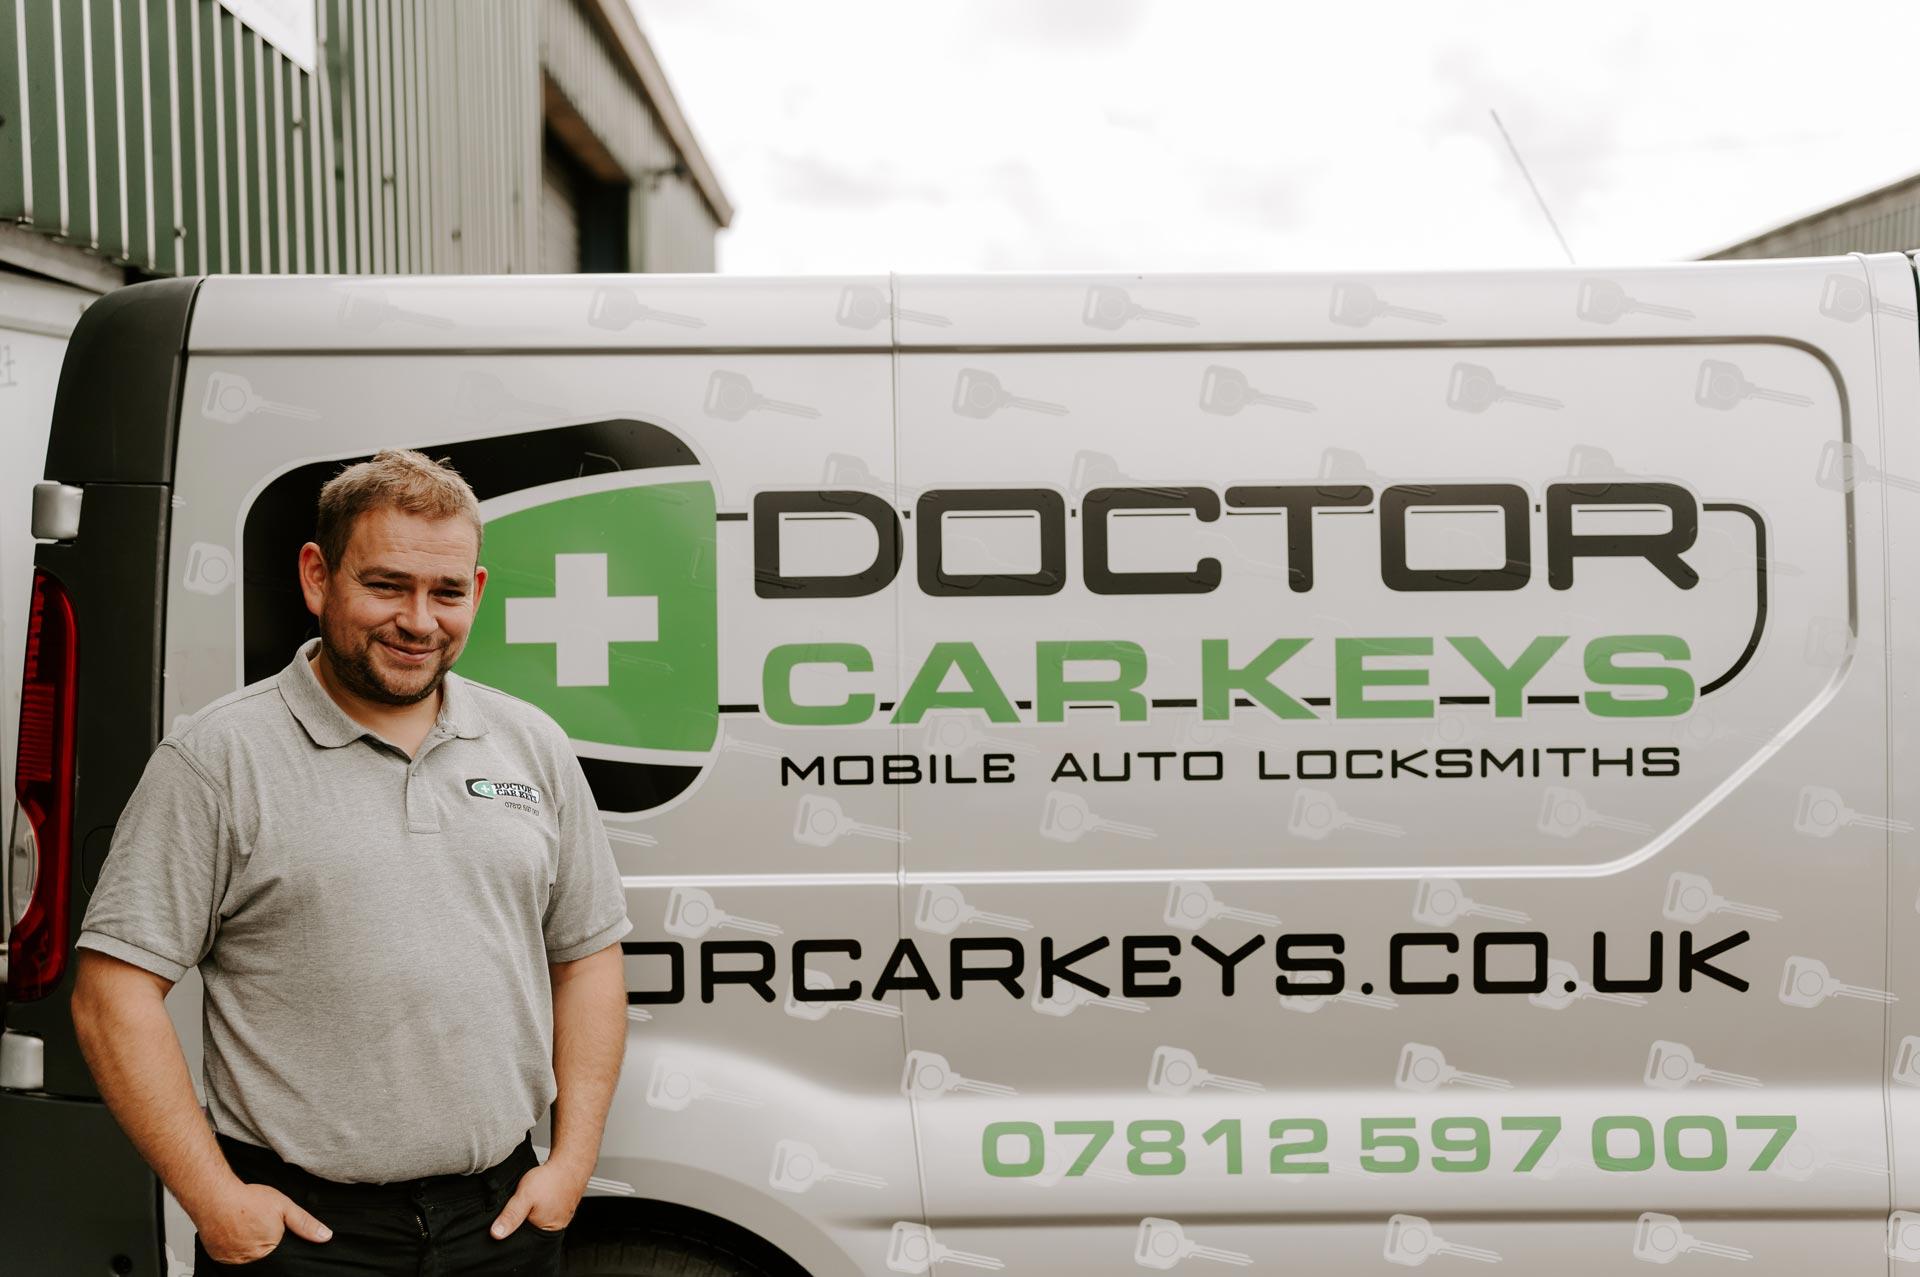 Auto Locksmiths in Camberley